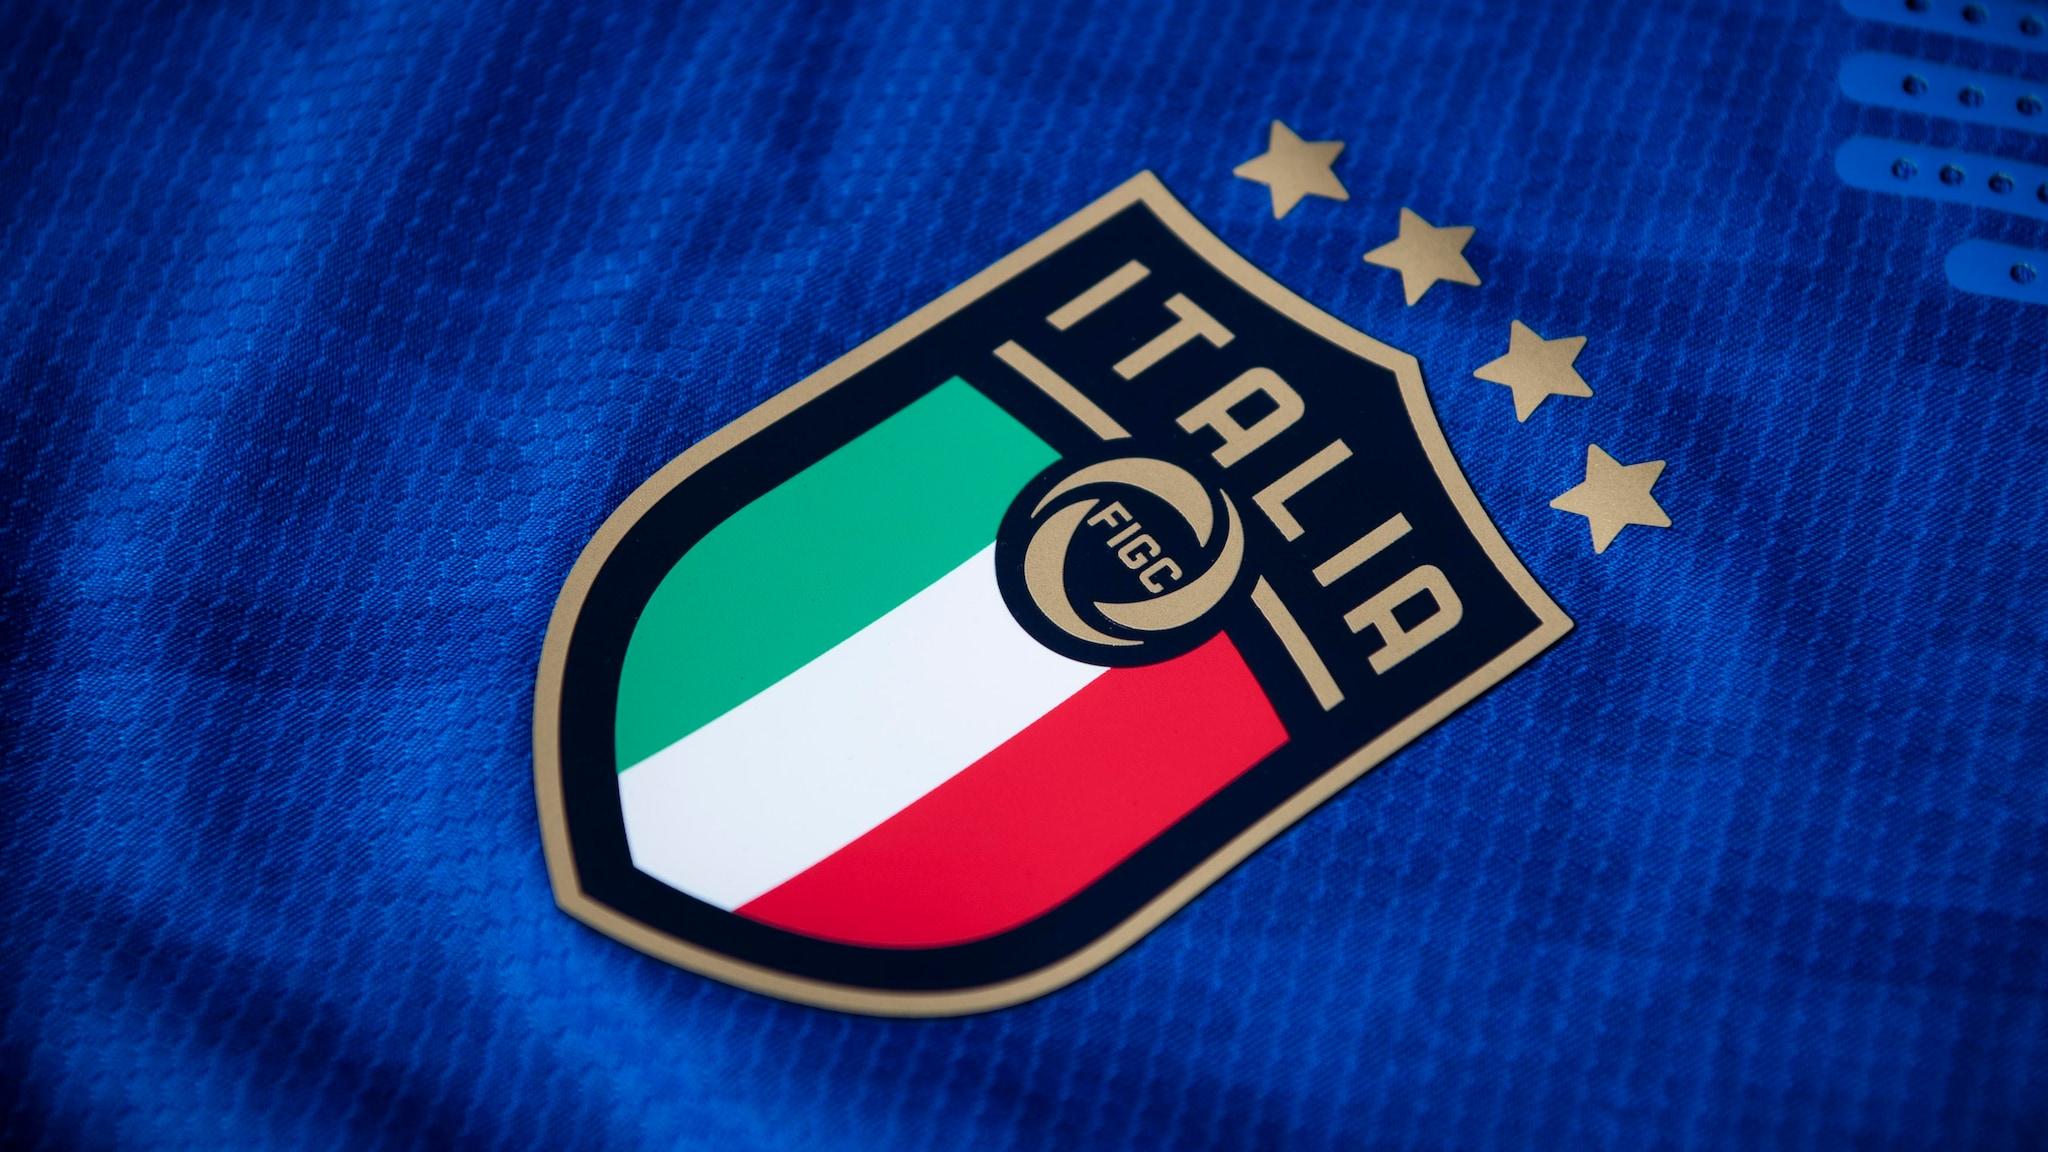 uefa euro 2020 - photo #29